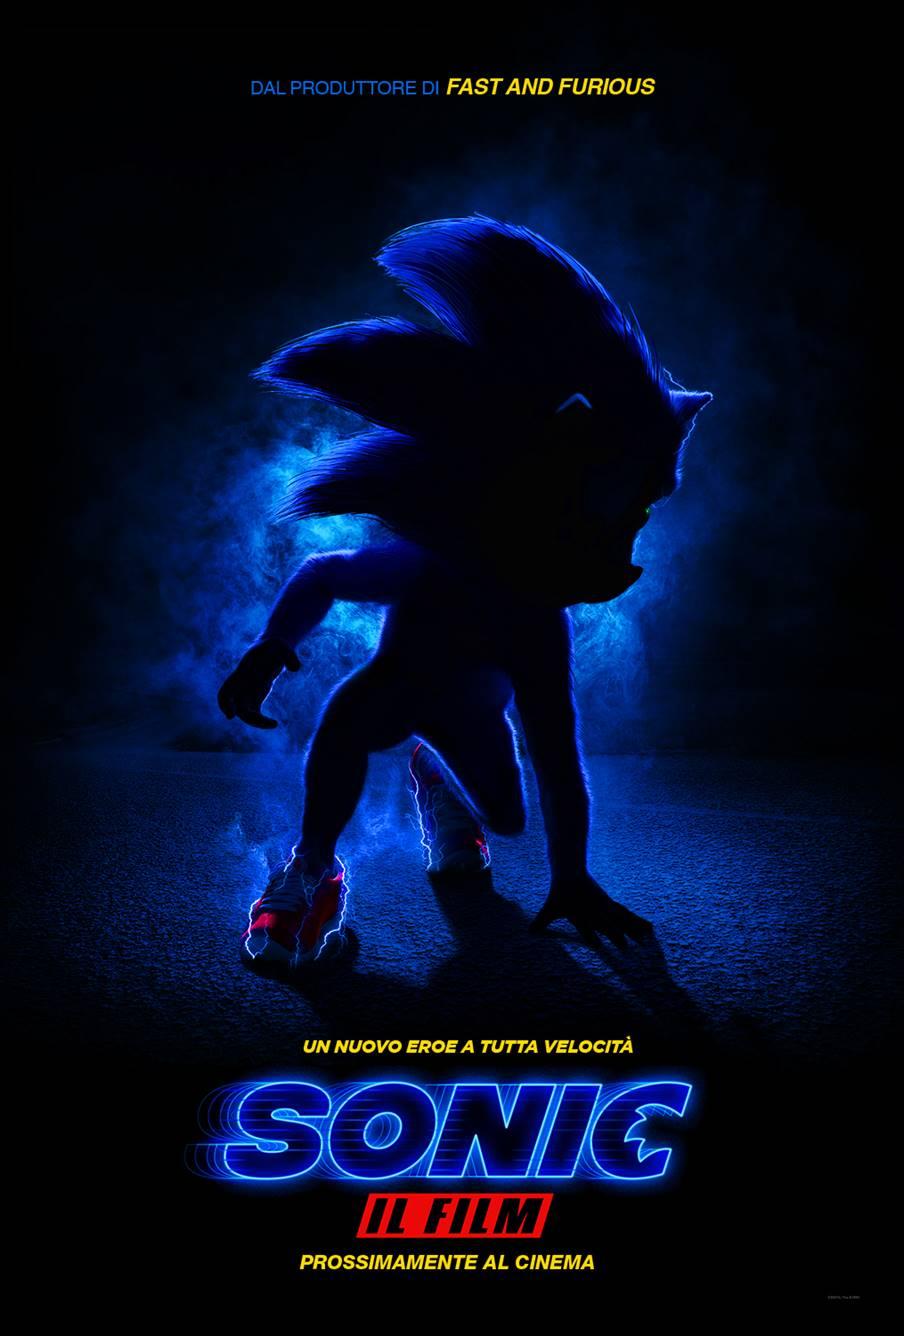 sonic il film poster